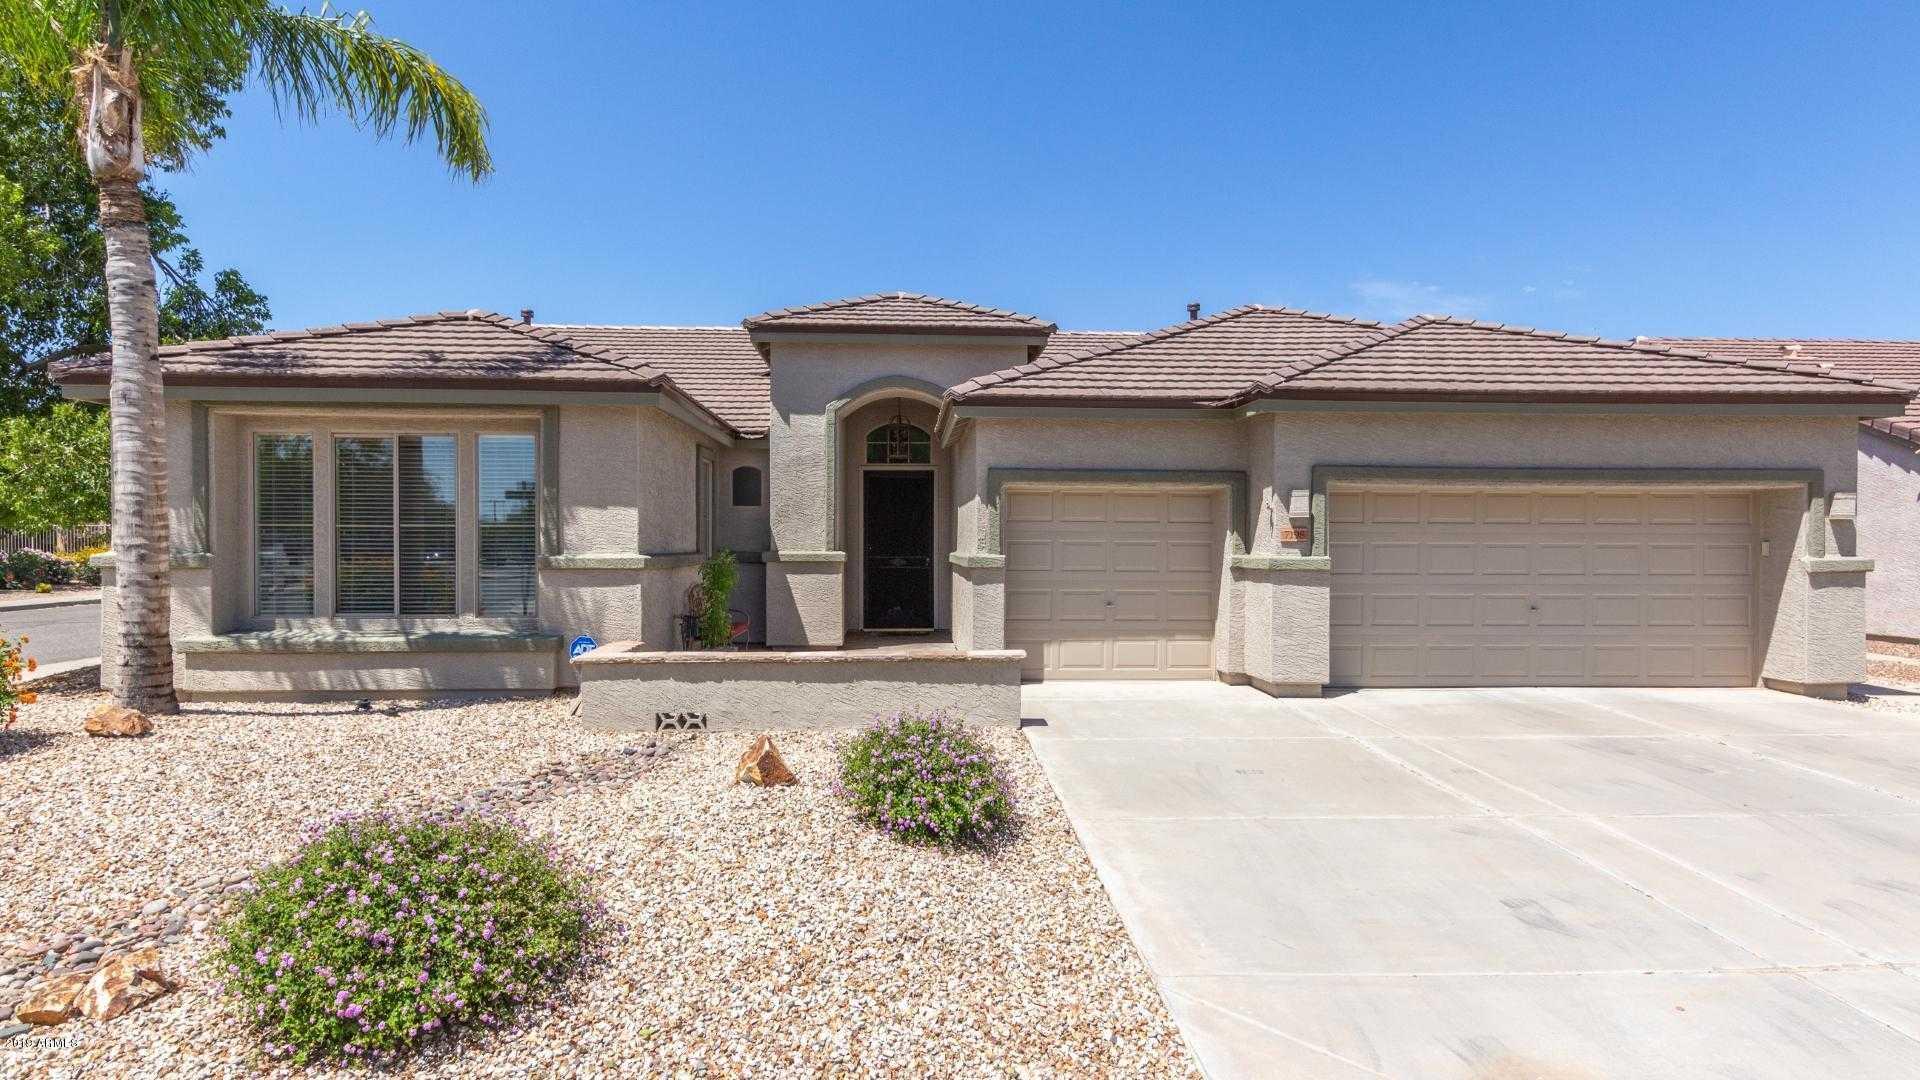 $425,000 - 4Br/2Ba - Home for Sale in Sabino 2, Glendale